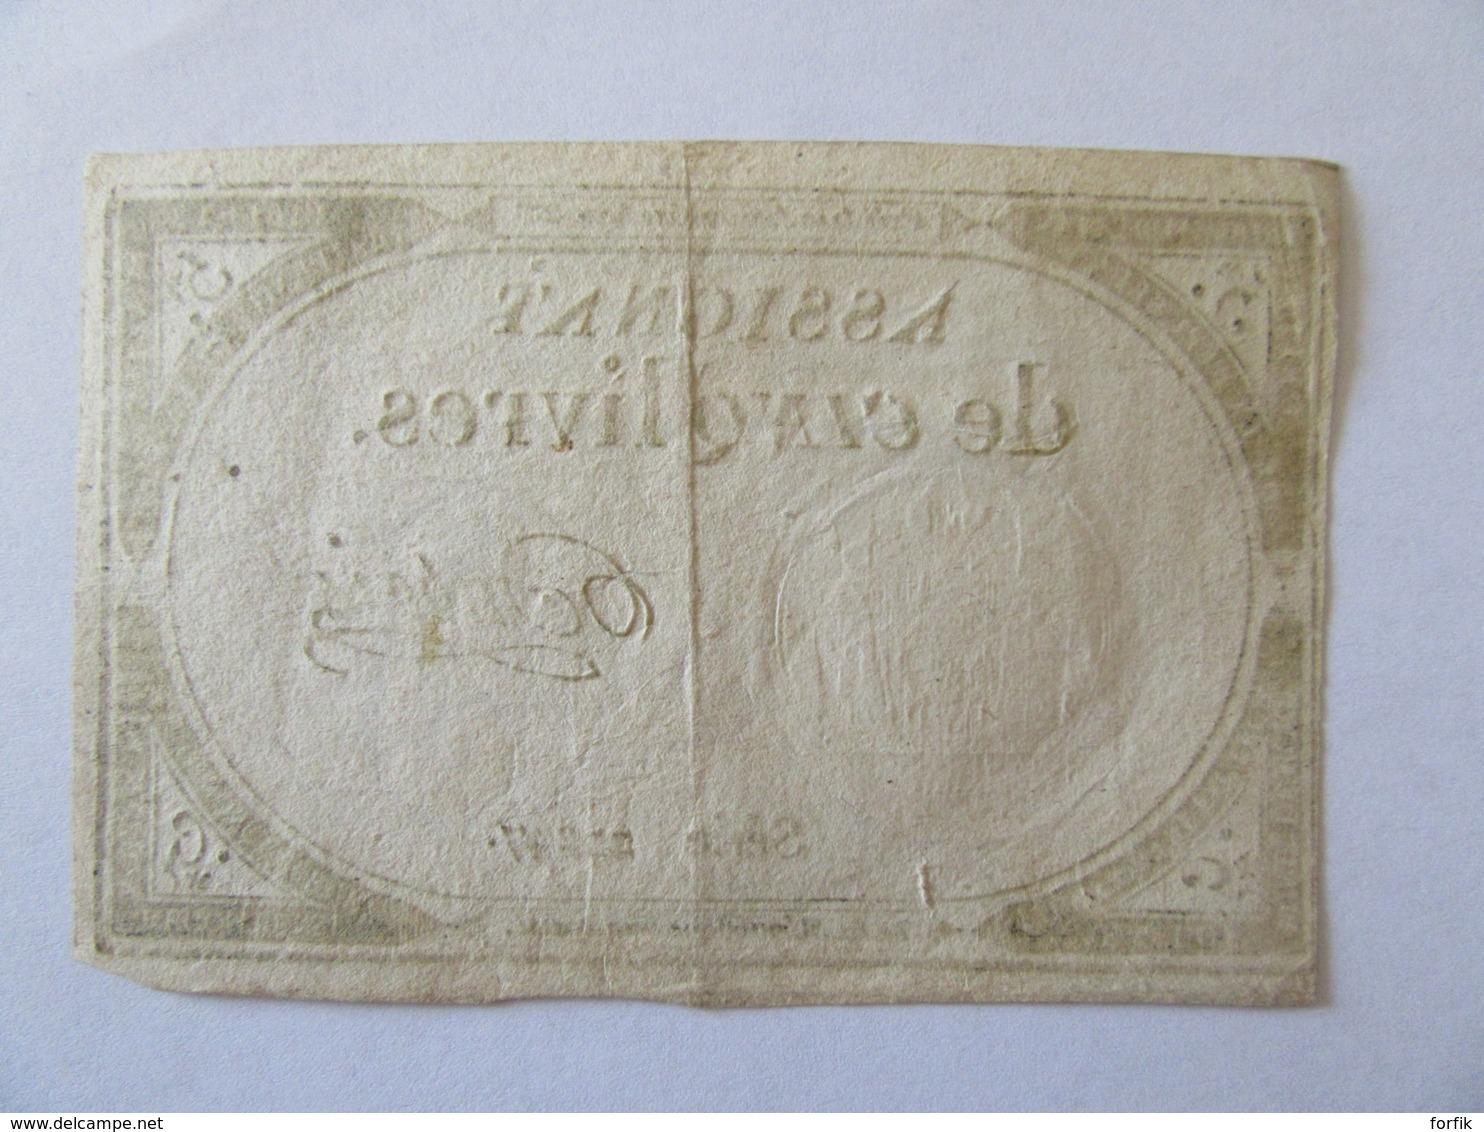 France - Assignat De 5 Livres - Série 20247 - Signature Dubois - Vers 1792 - Assignats